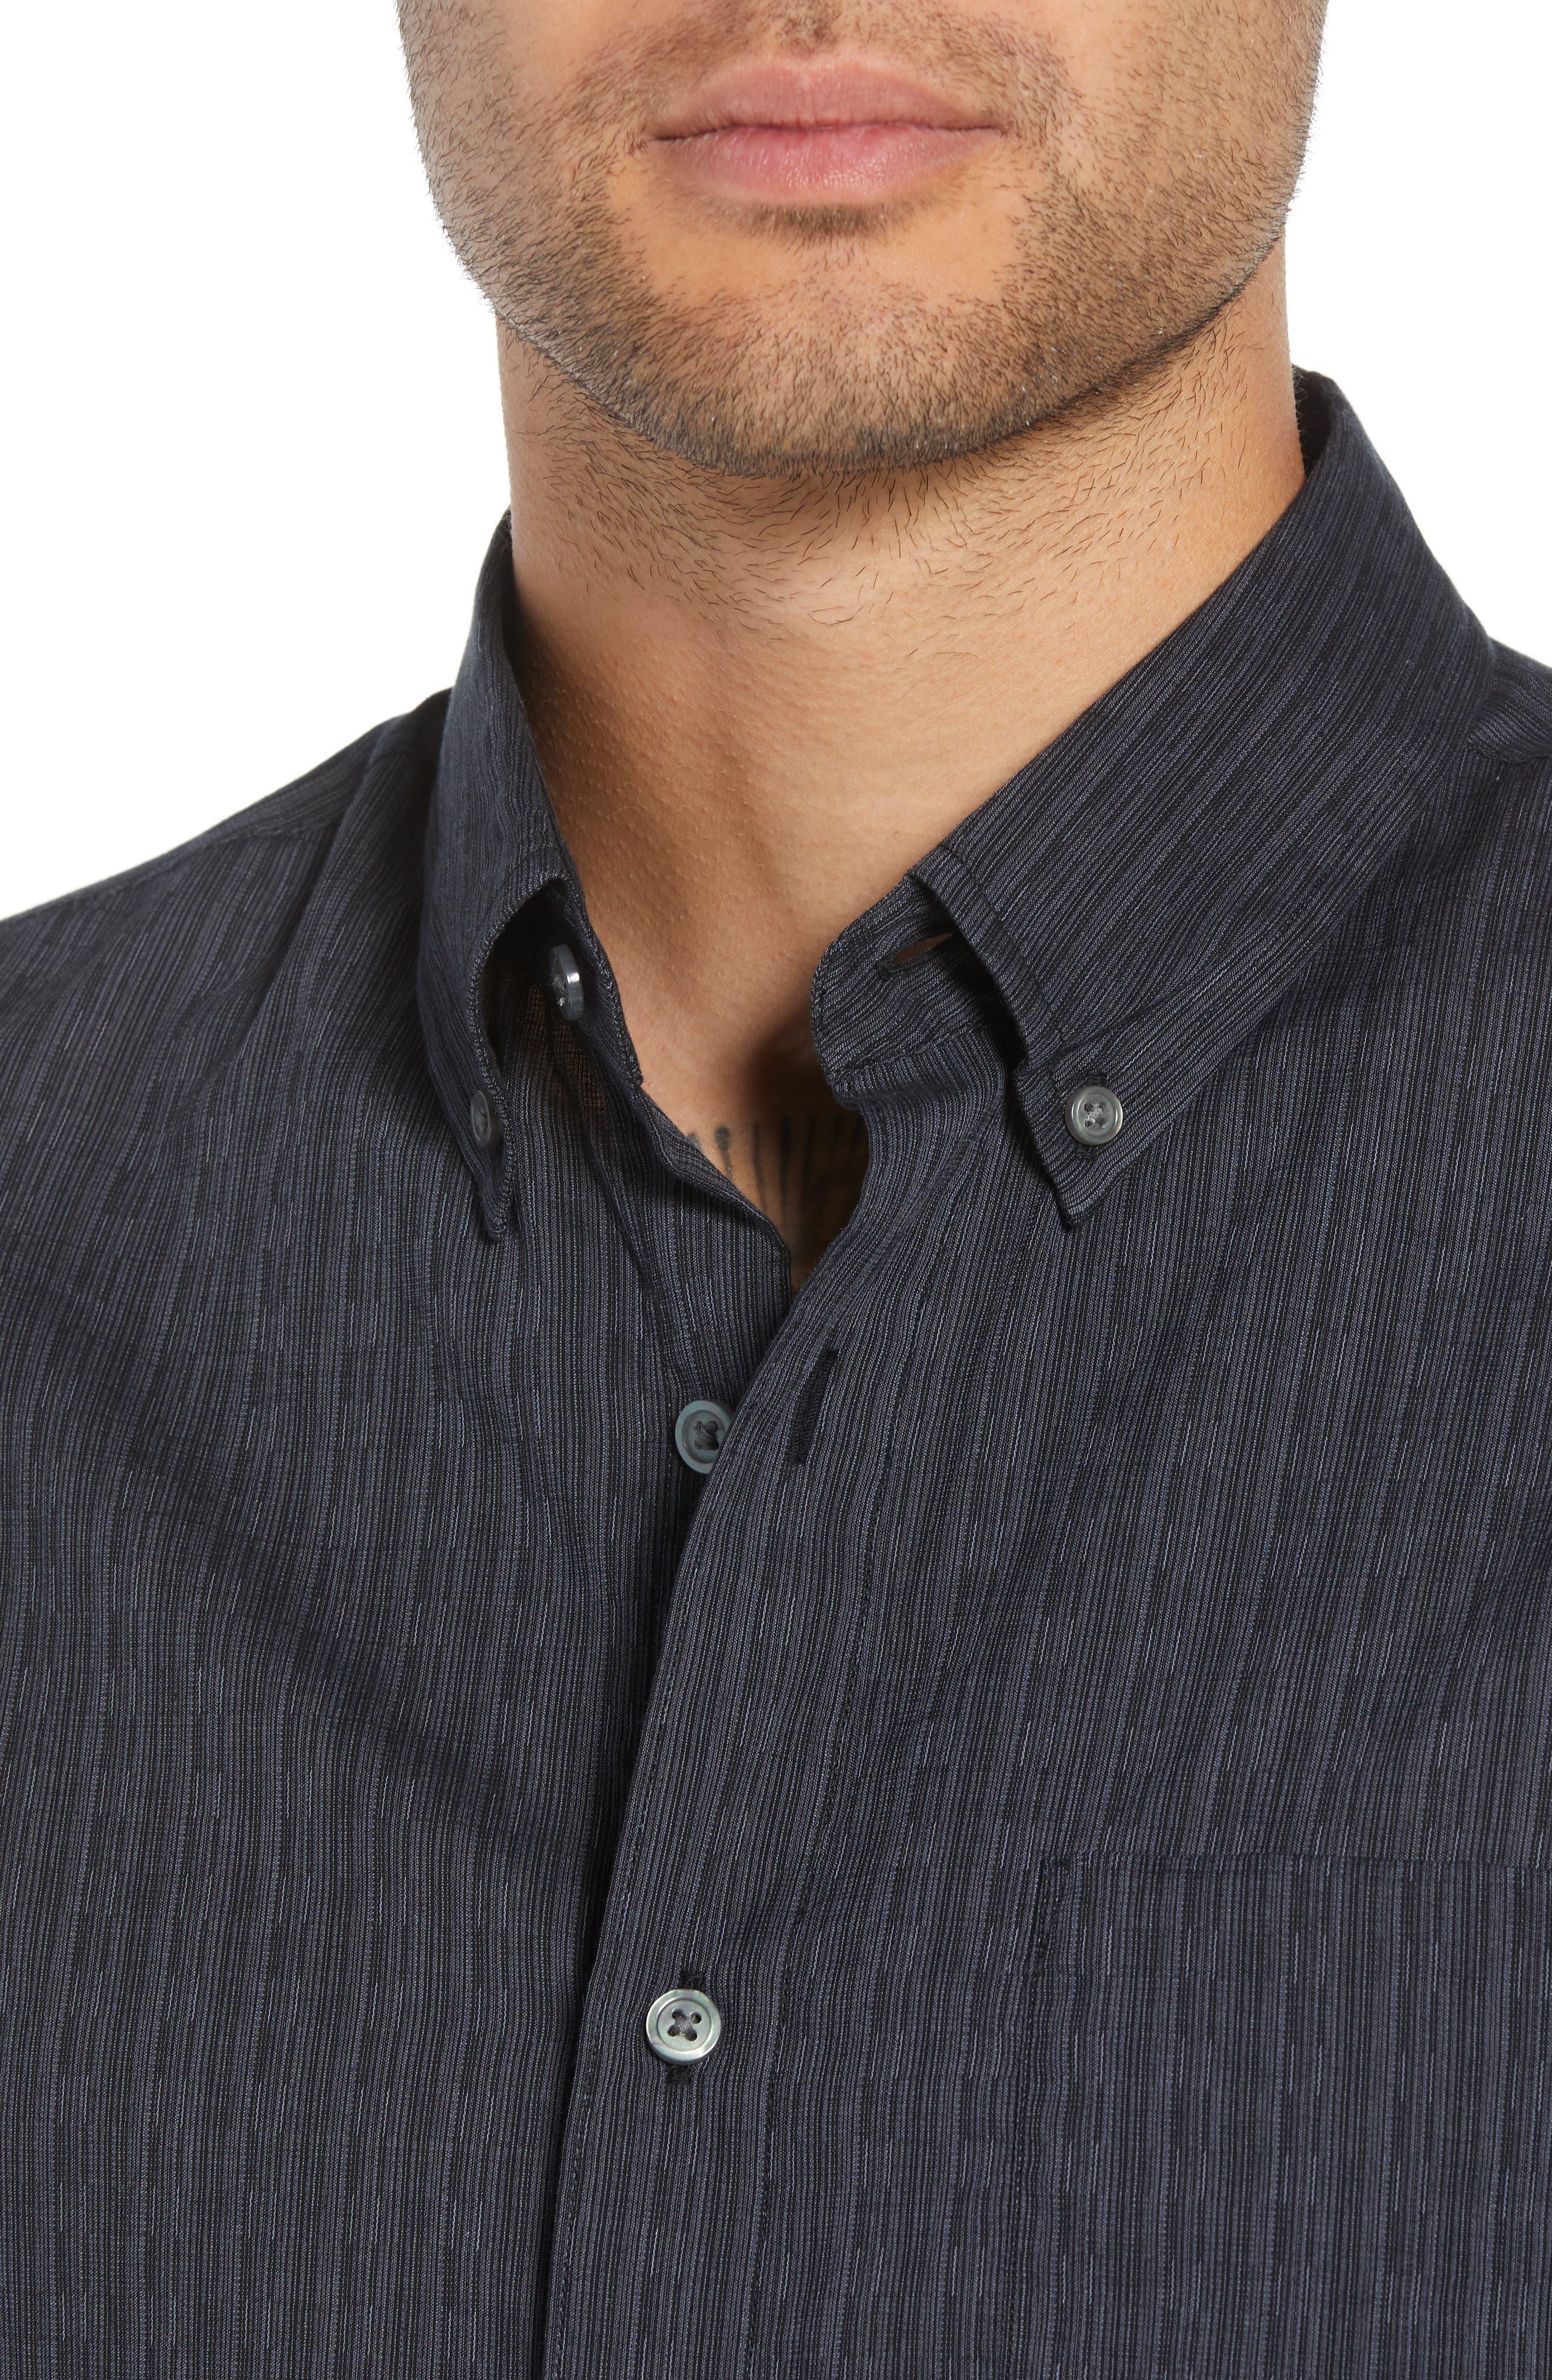 Regular Fit Roll Sleeve Sport Shirt,                             Alternate thumbnail 2, color,                             BLACK